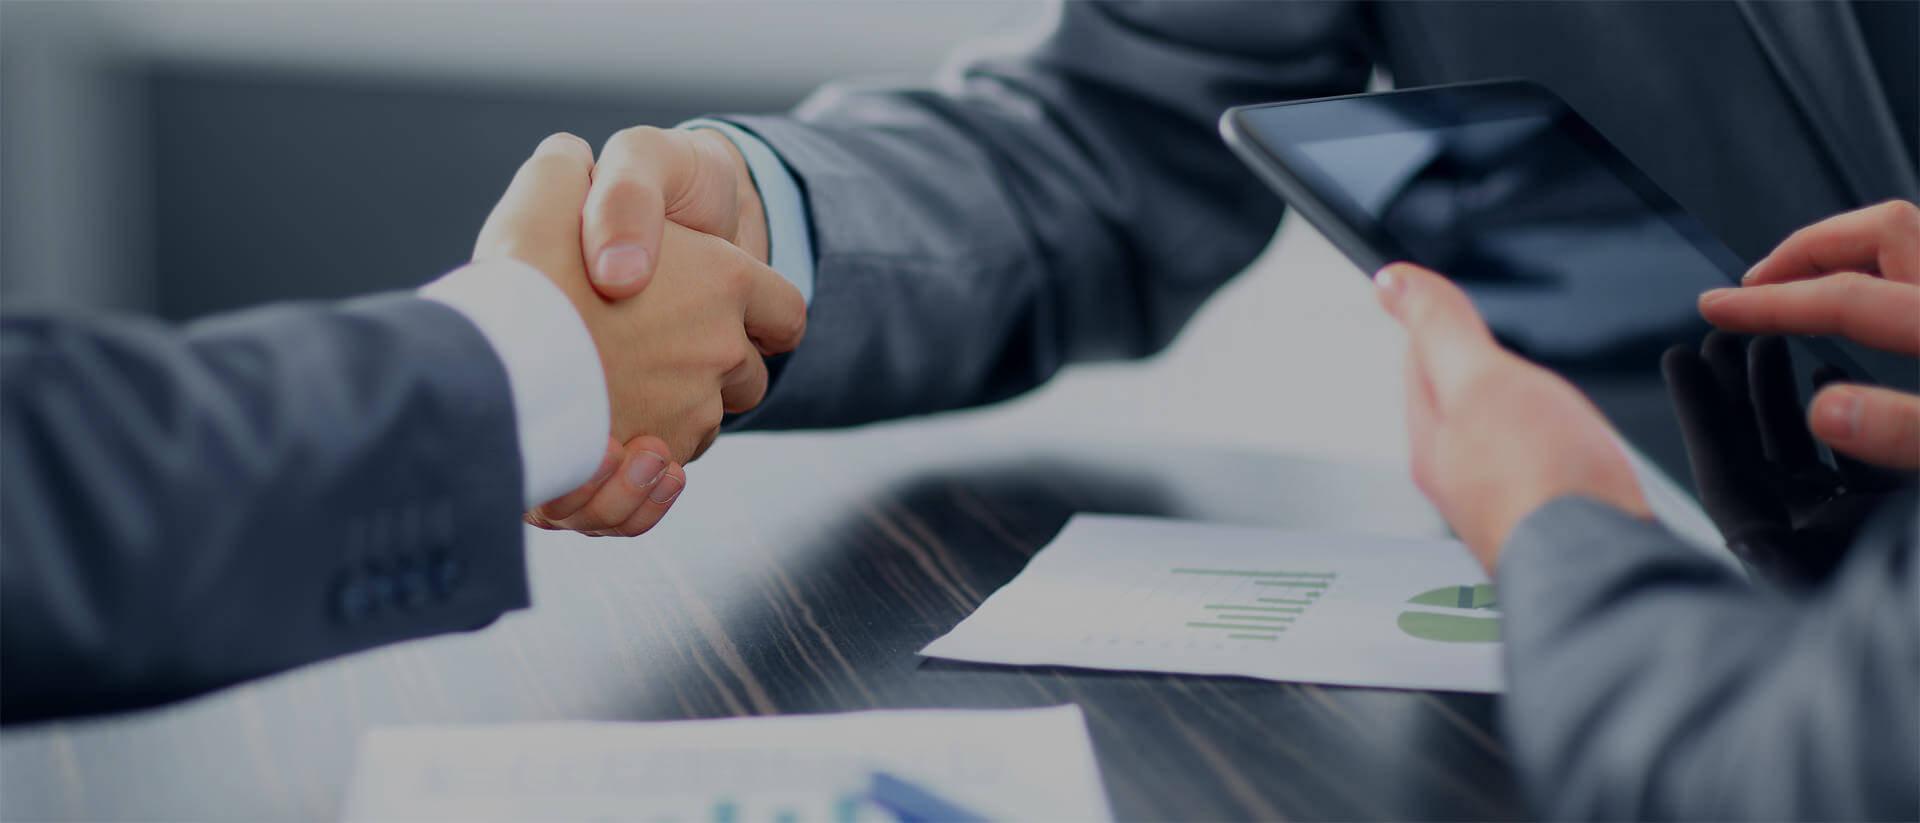 Simplify supply chain management with ERA's vendor partnership program.